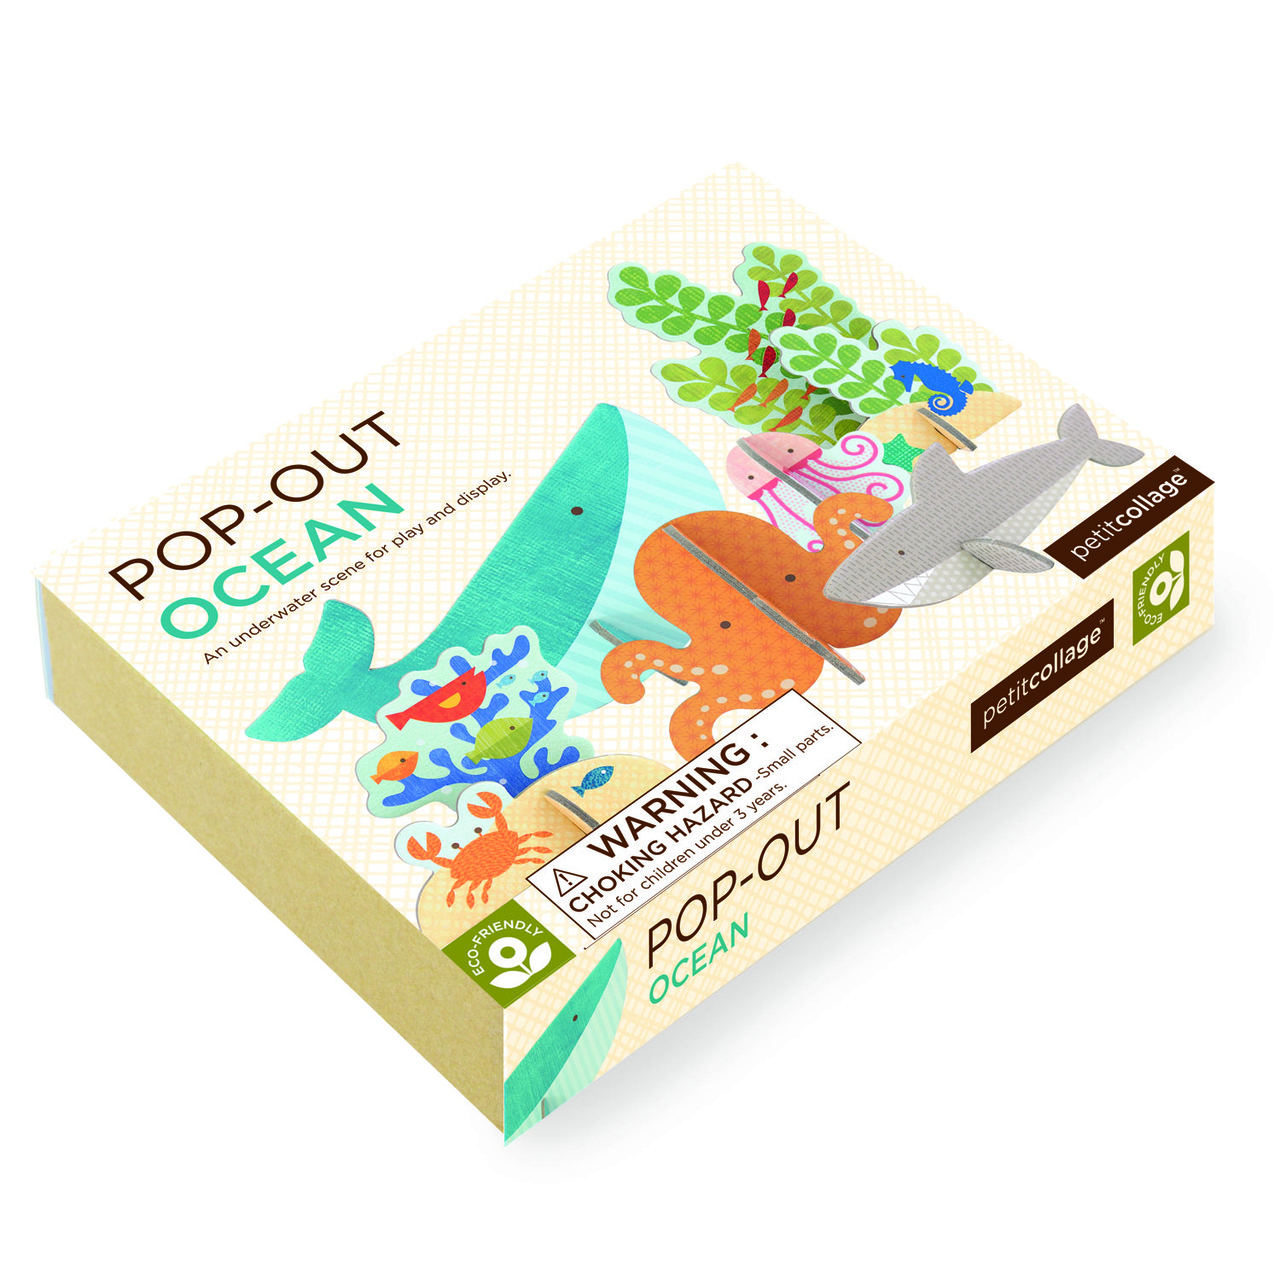 Petit Collage Ocean Pop-out Packaging